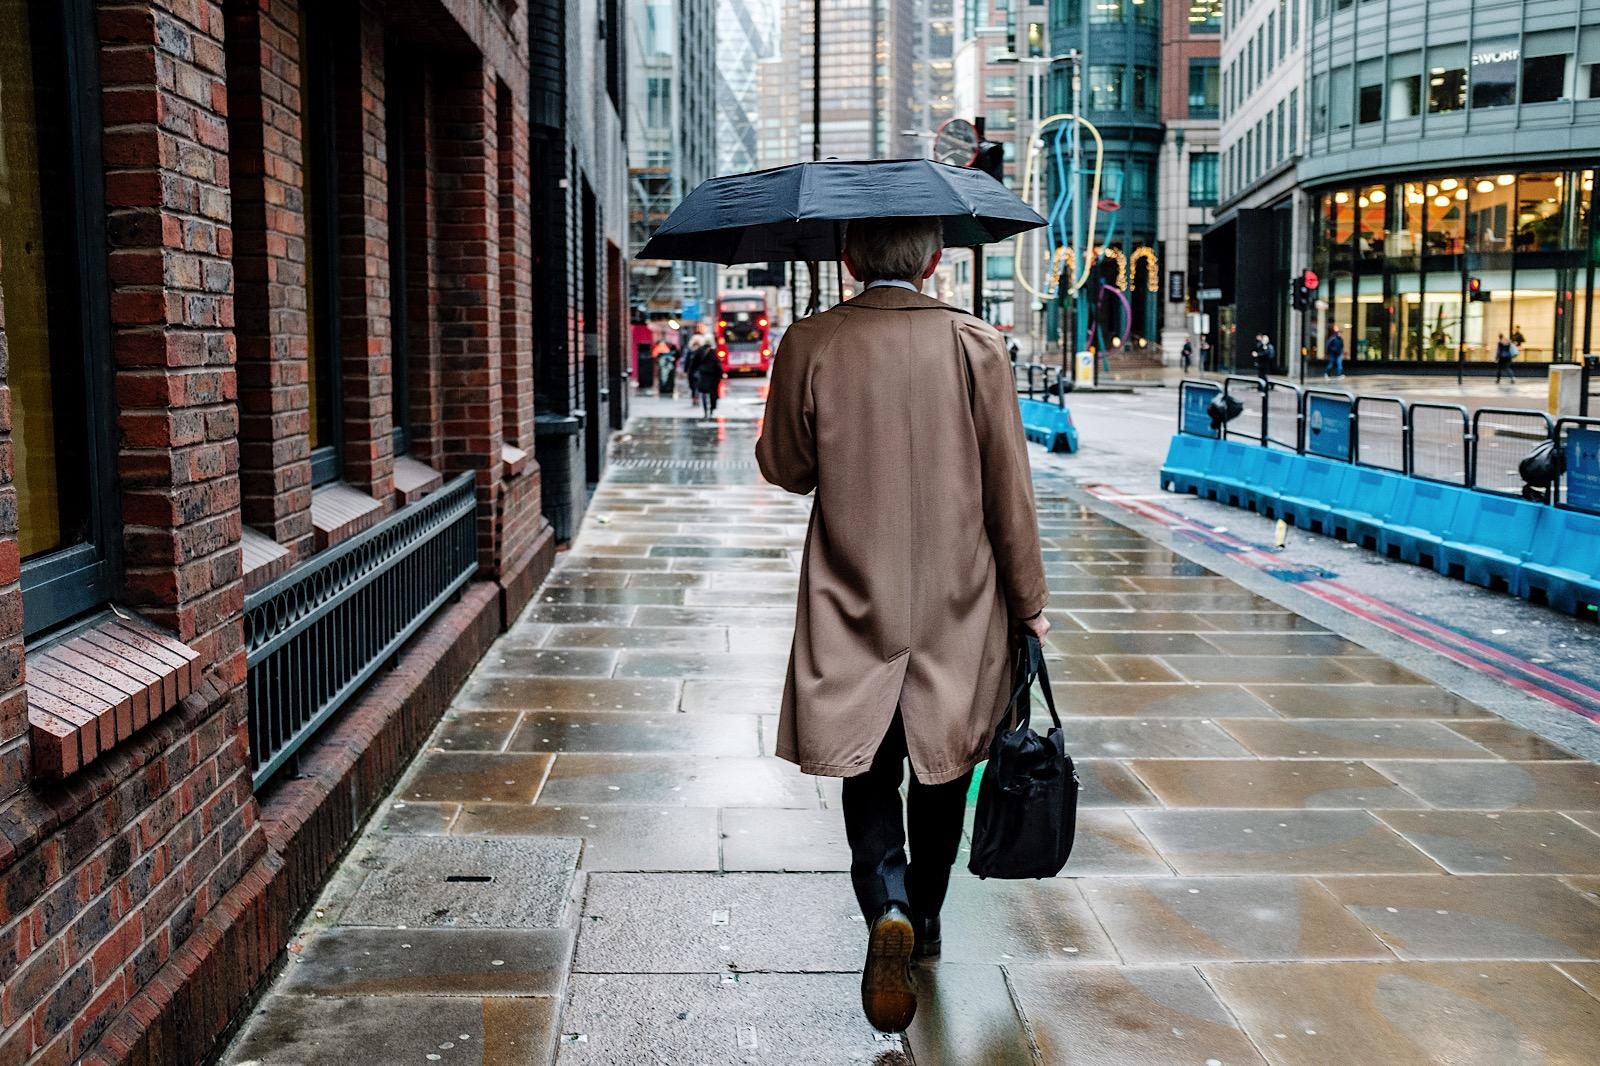 Business Man in rain mac with umbrella walking through streets of London